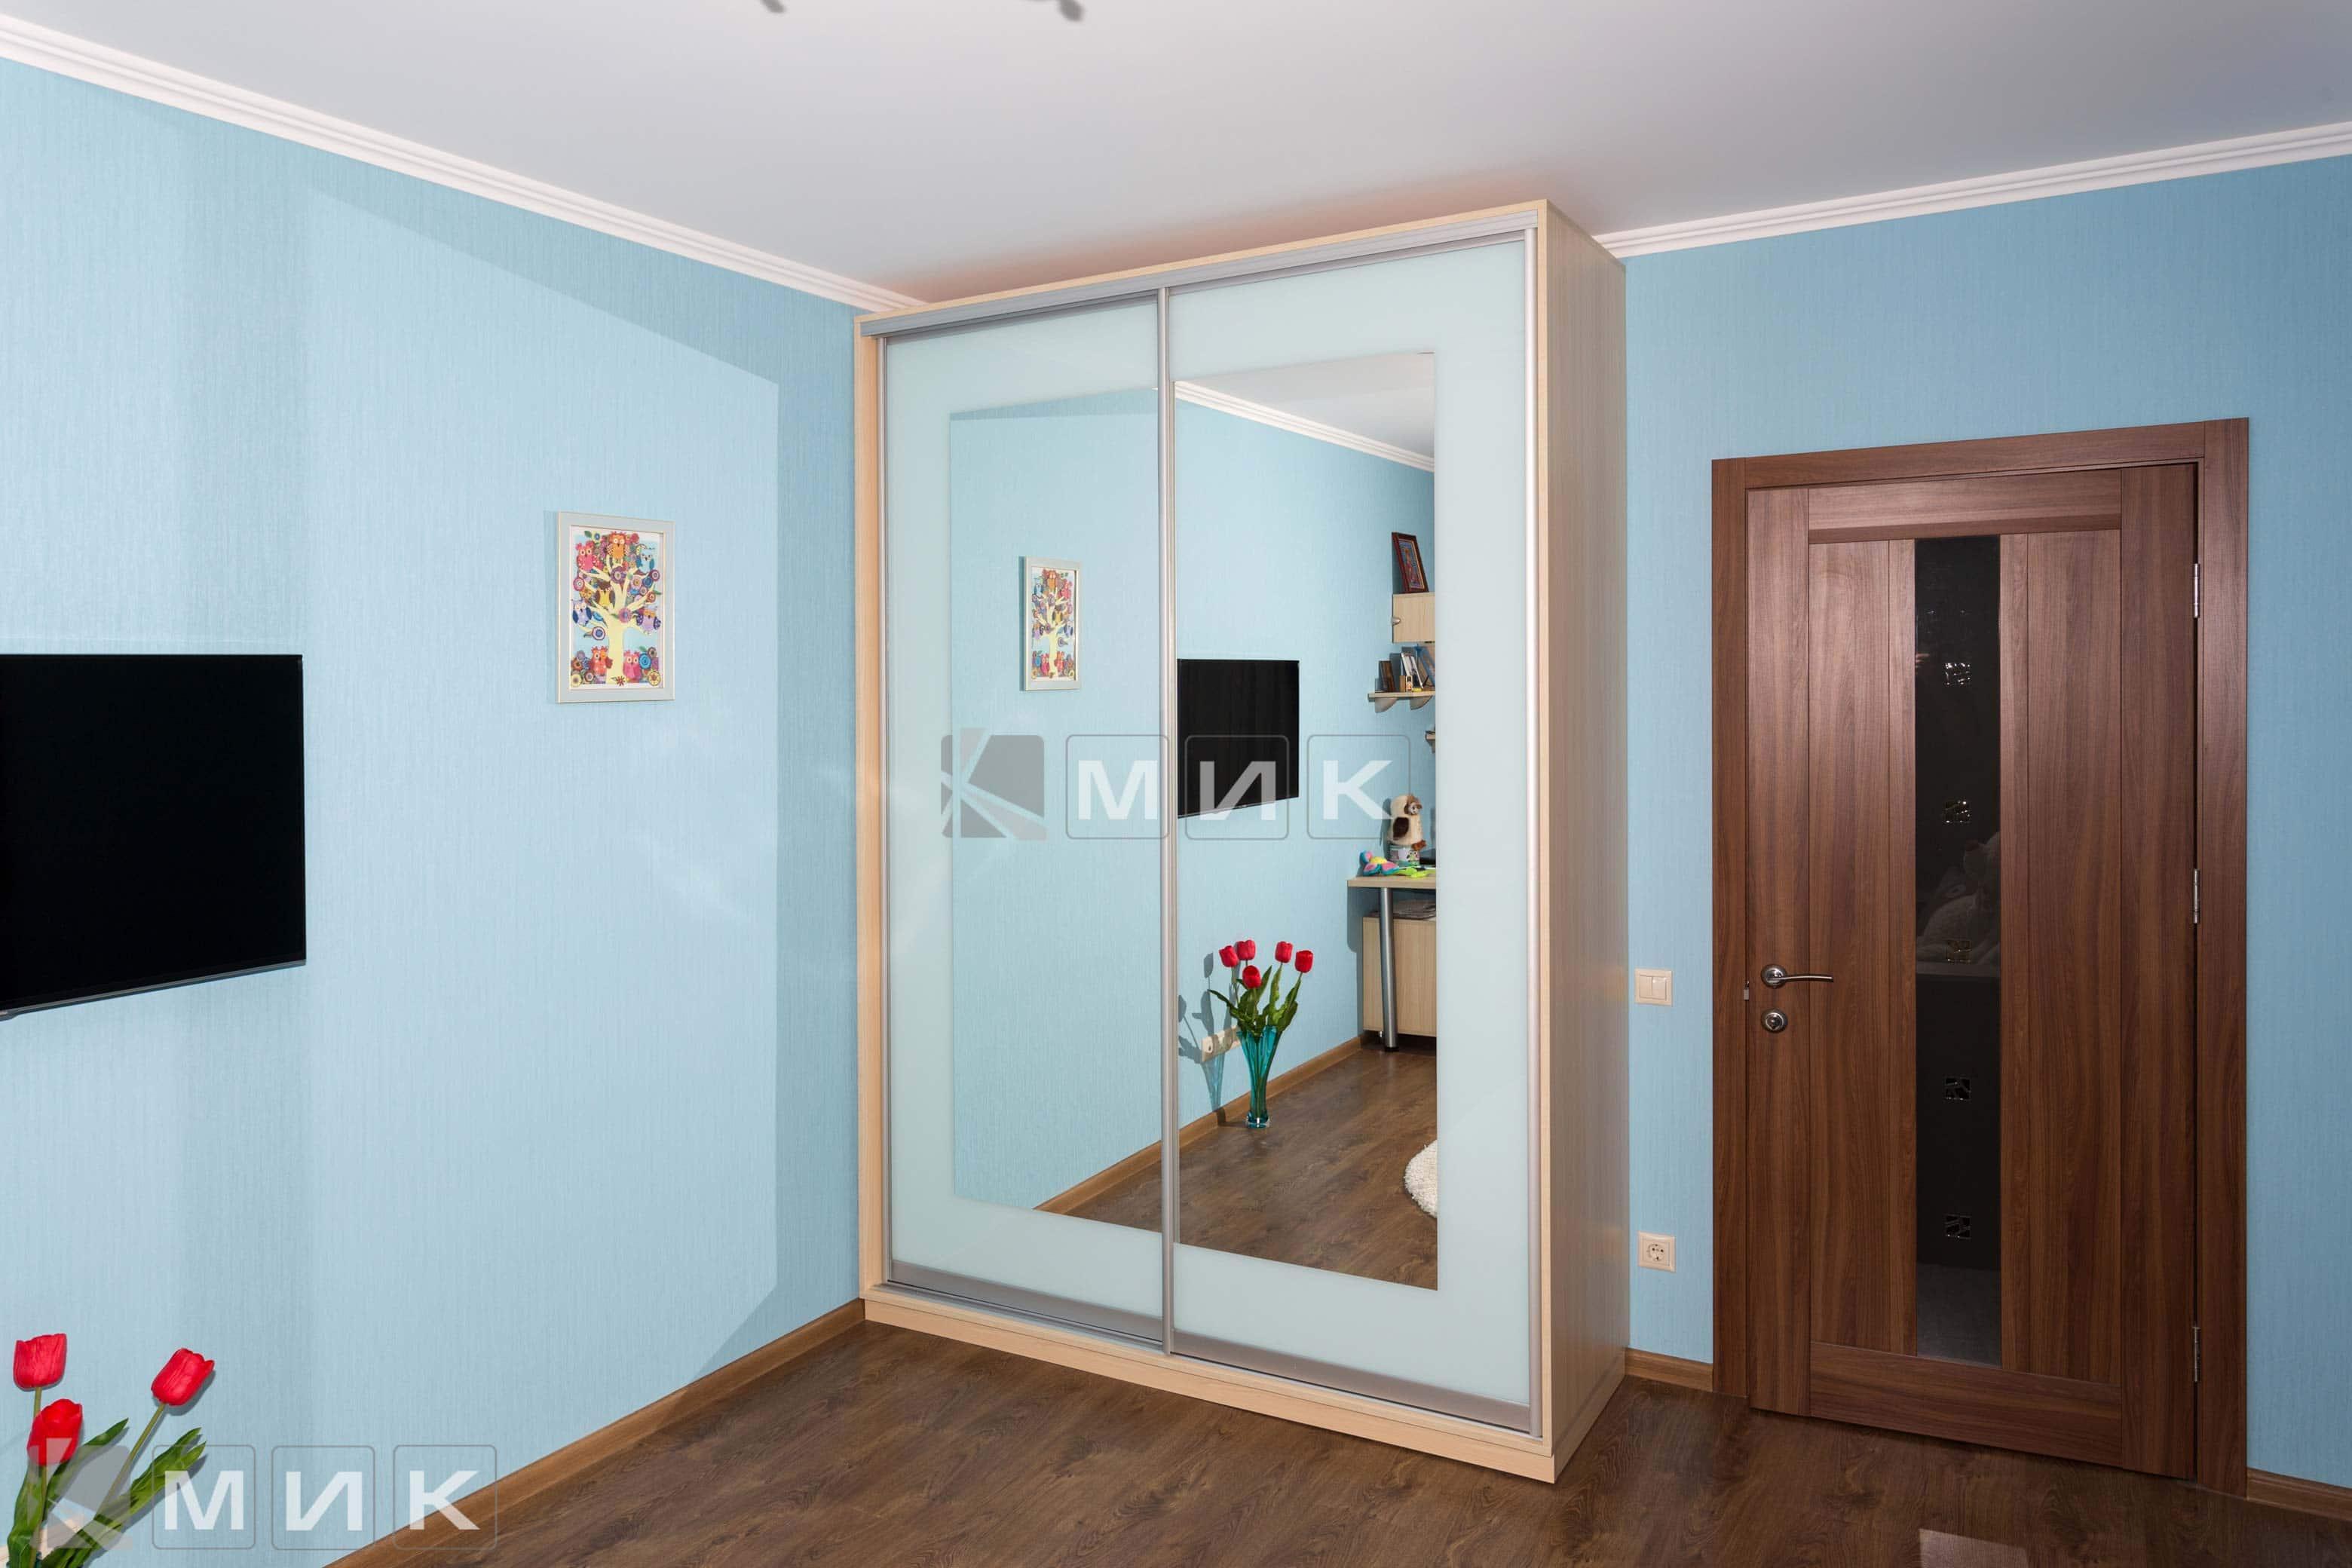 Шкаф купе с голубой покраской зеркала